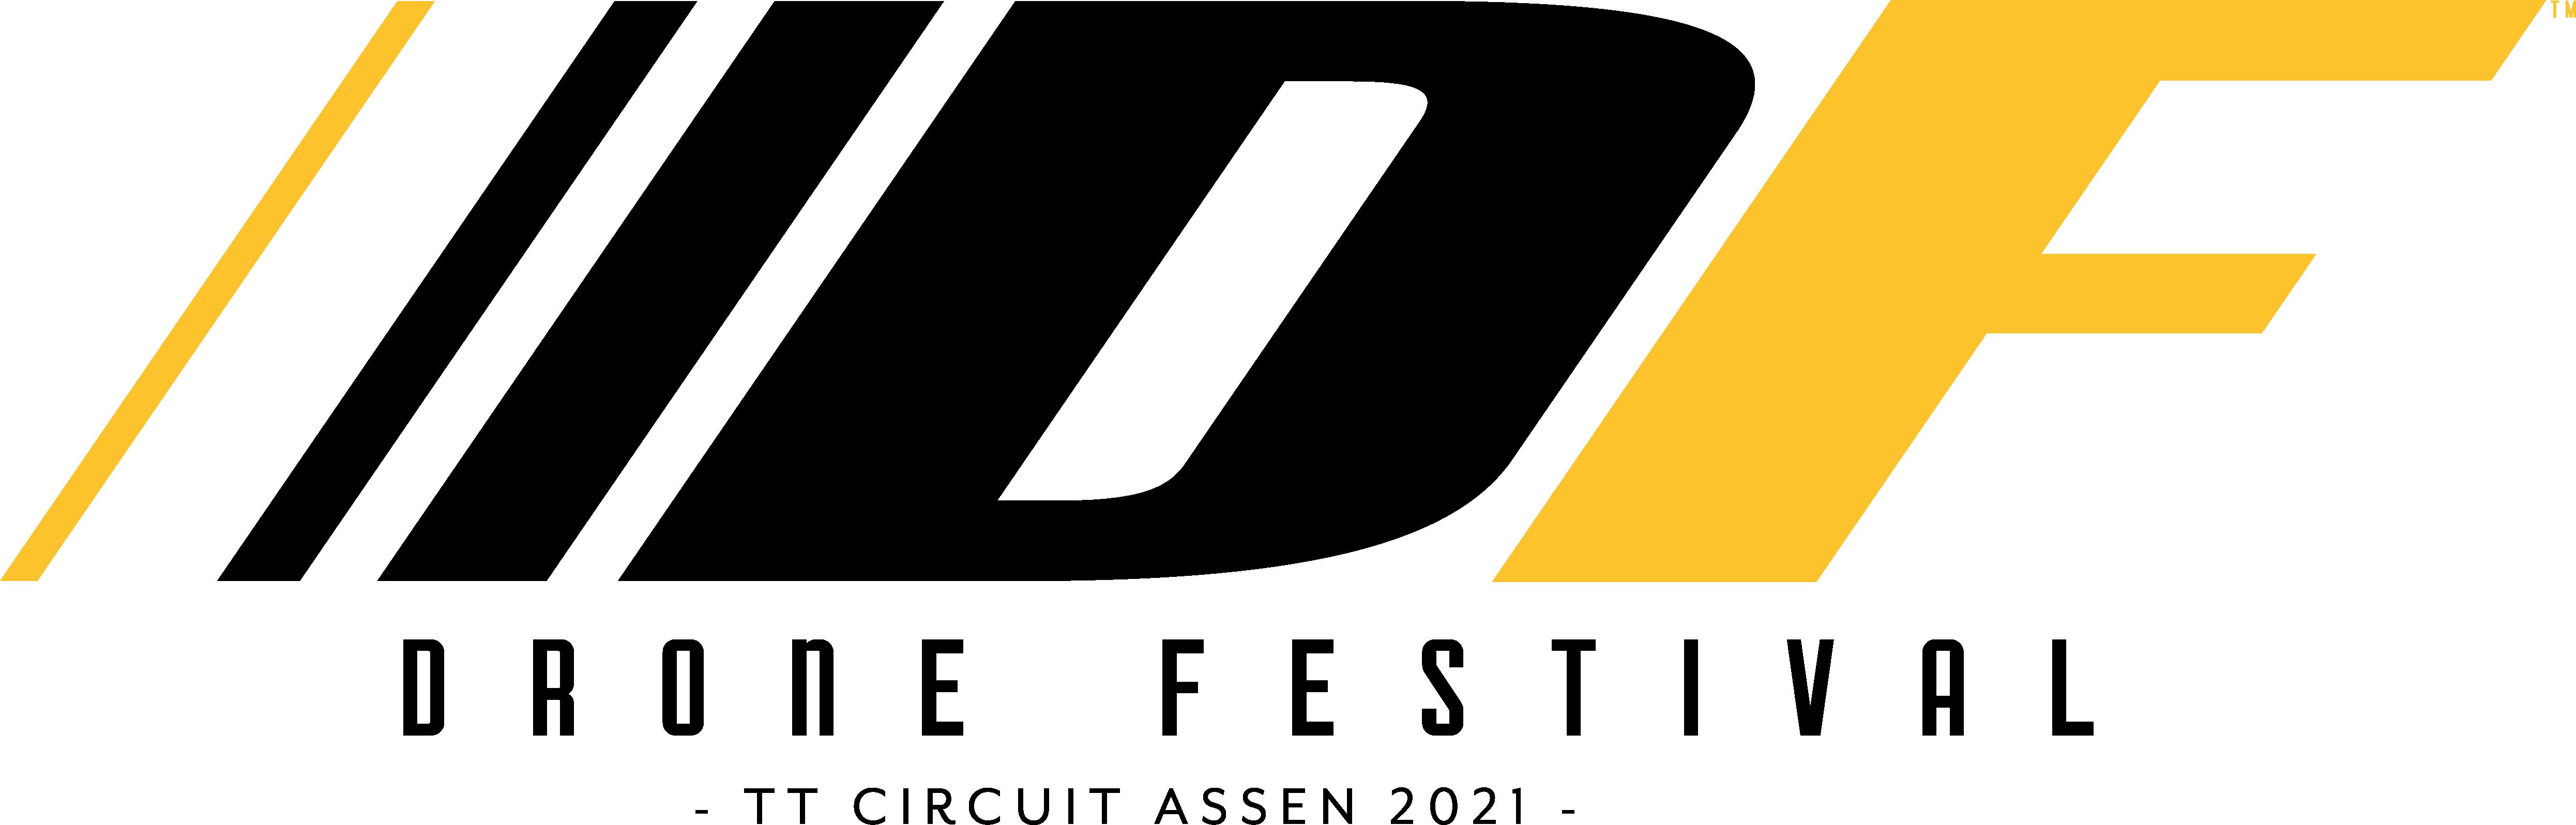 Drone Festival Assen Logo